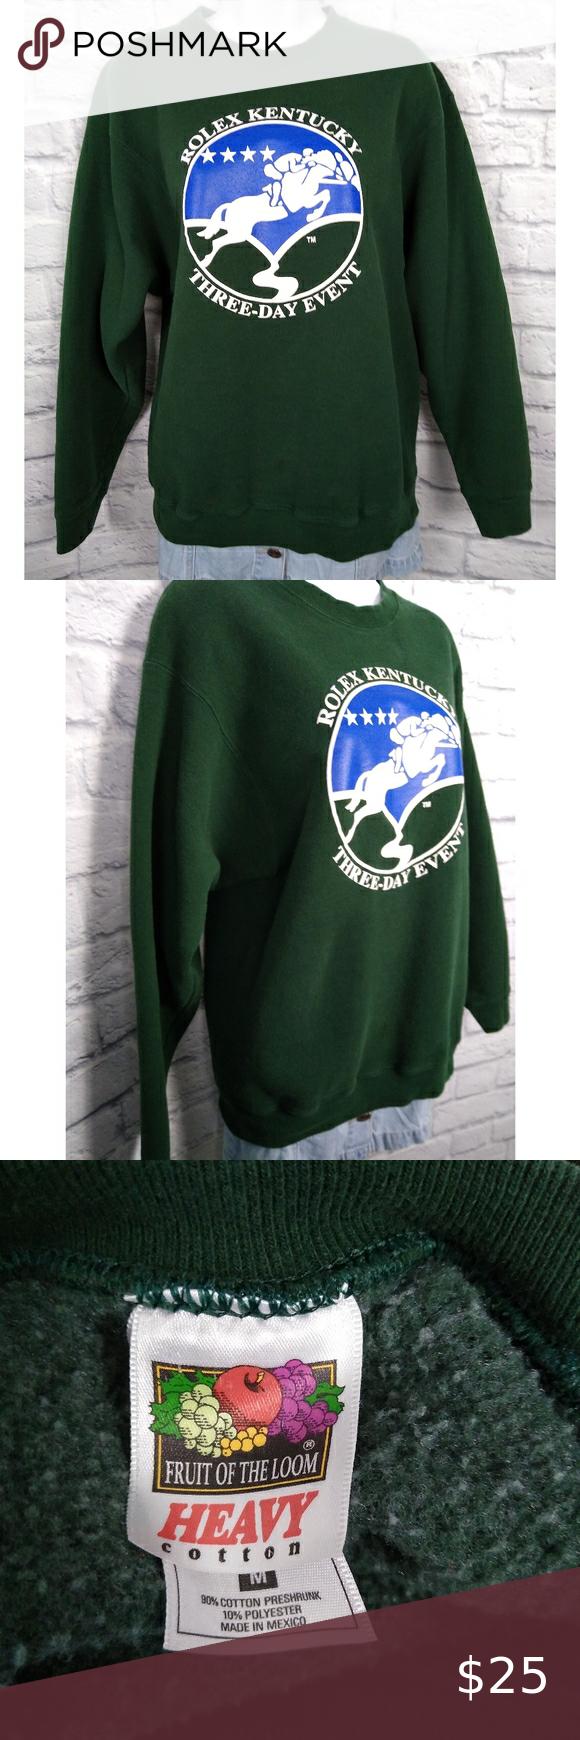 Vintage Rolex Crewneck Sweatshirt Size Medium Sweatshirts Crew Neck Sweatshirt Vintage Sweatshirt [ 1740 x 580 Pixel ]